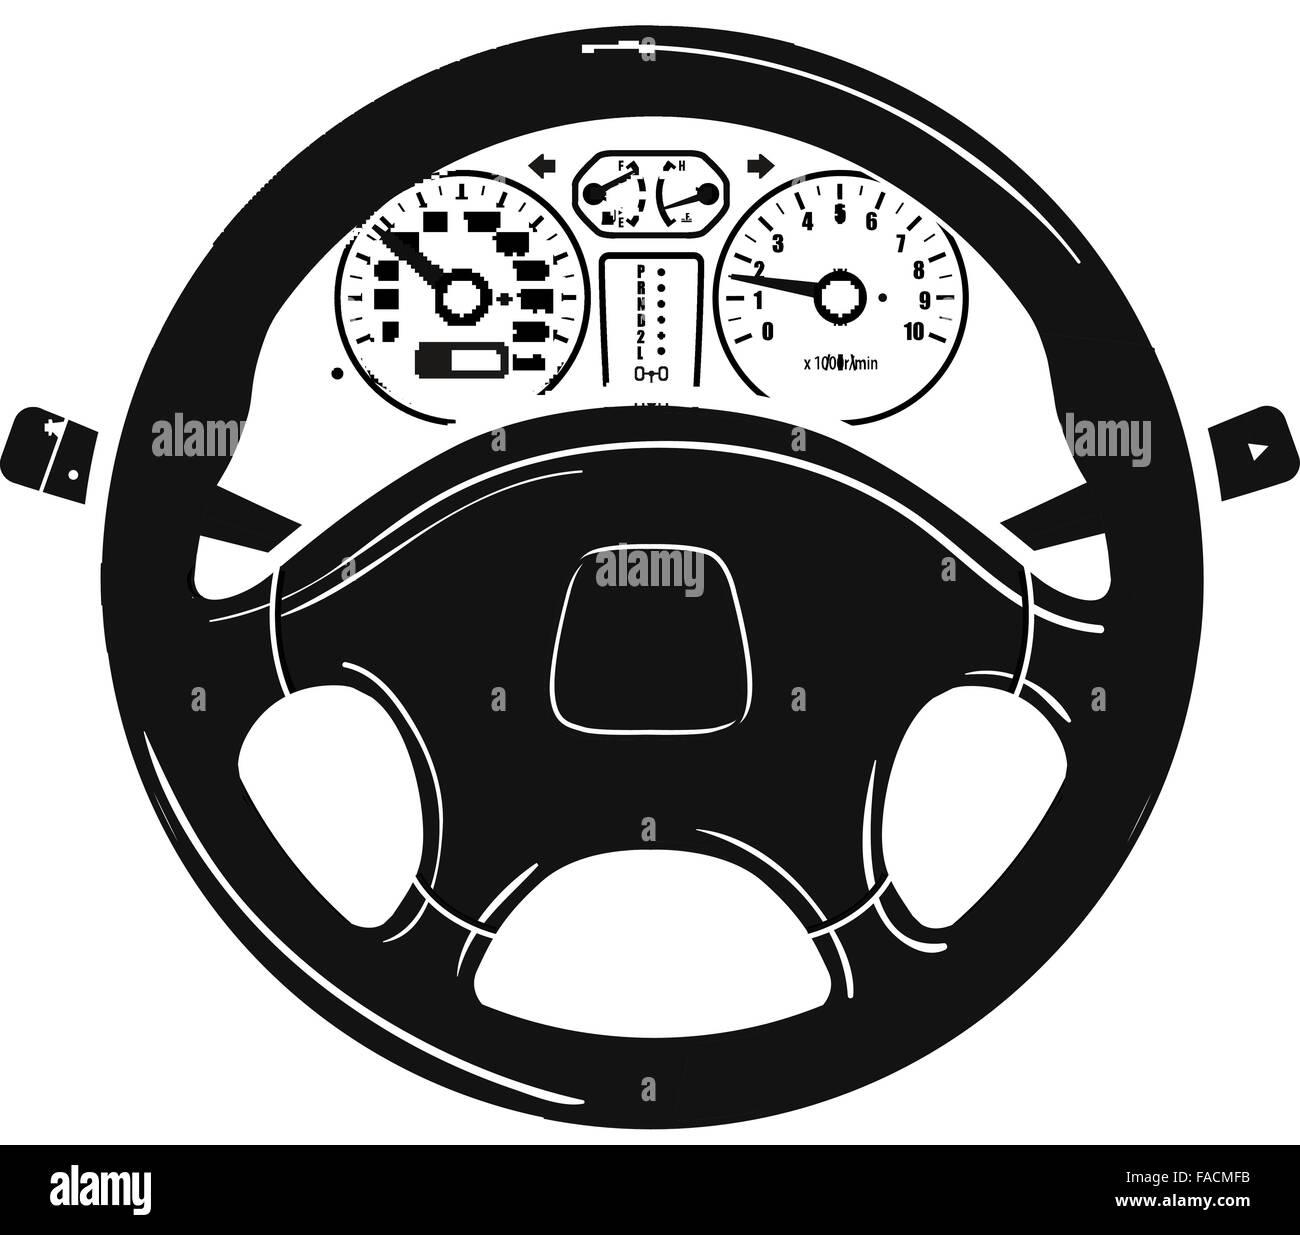 Auto Lenkrad Vektor-Logo Design-Vorlage. Fahrzeug, Auto oder Auto ...